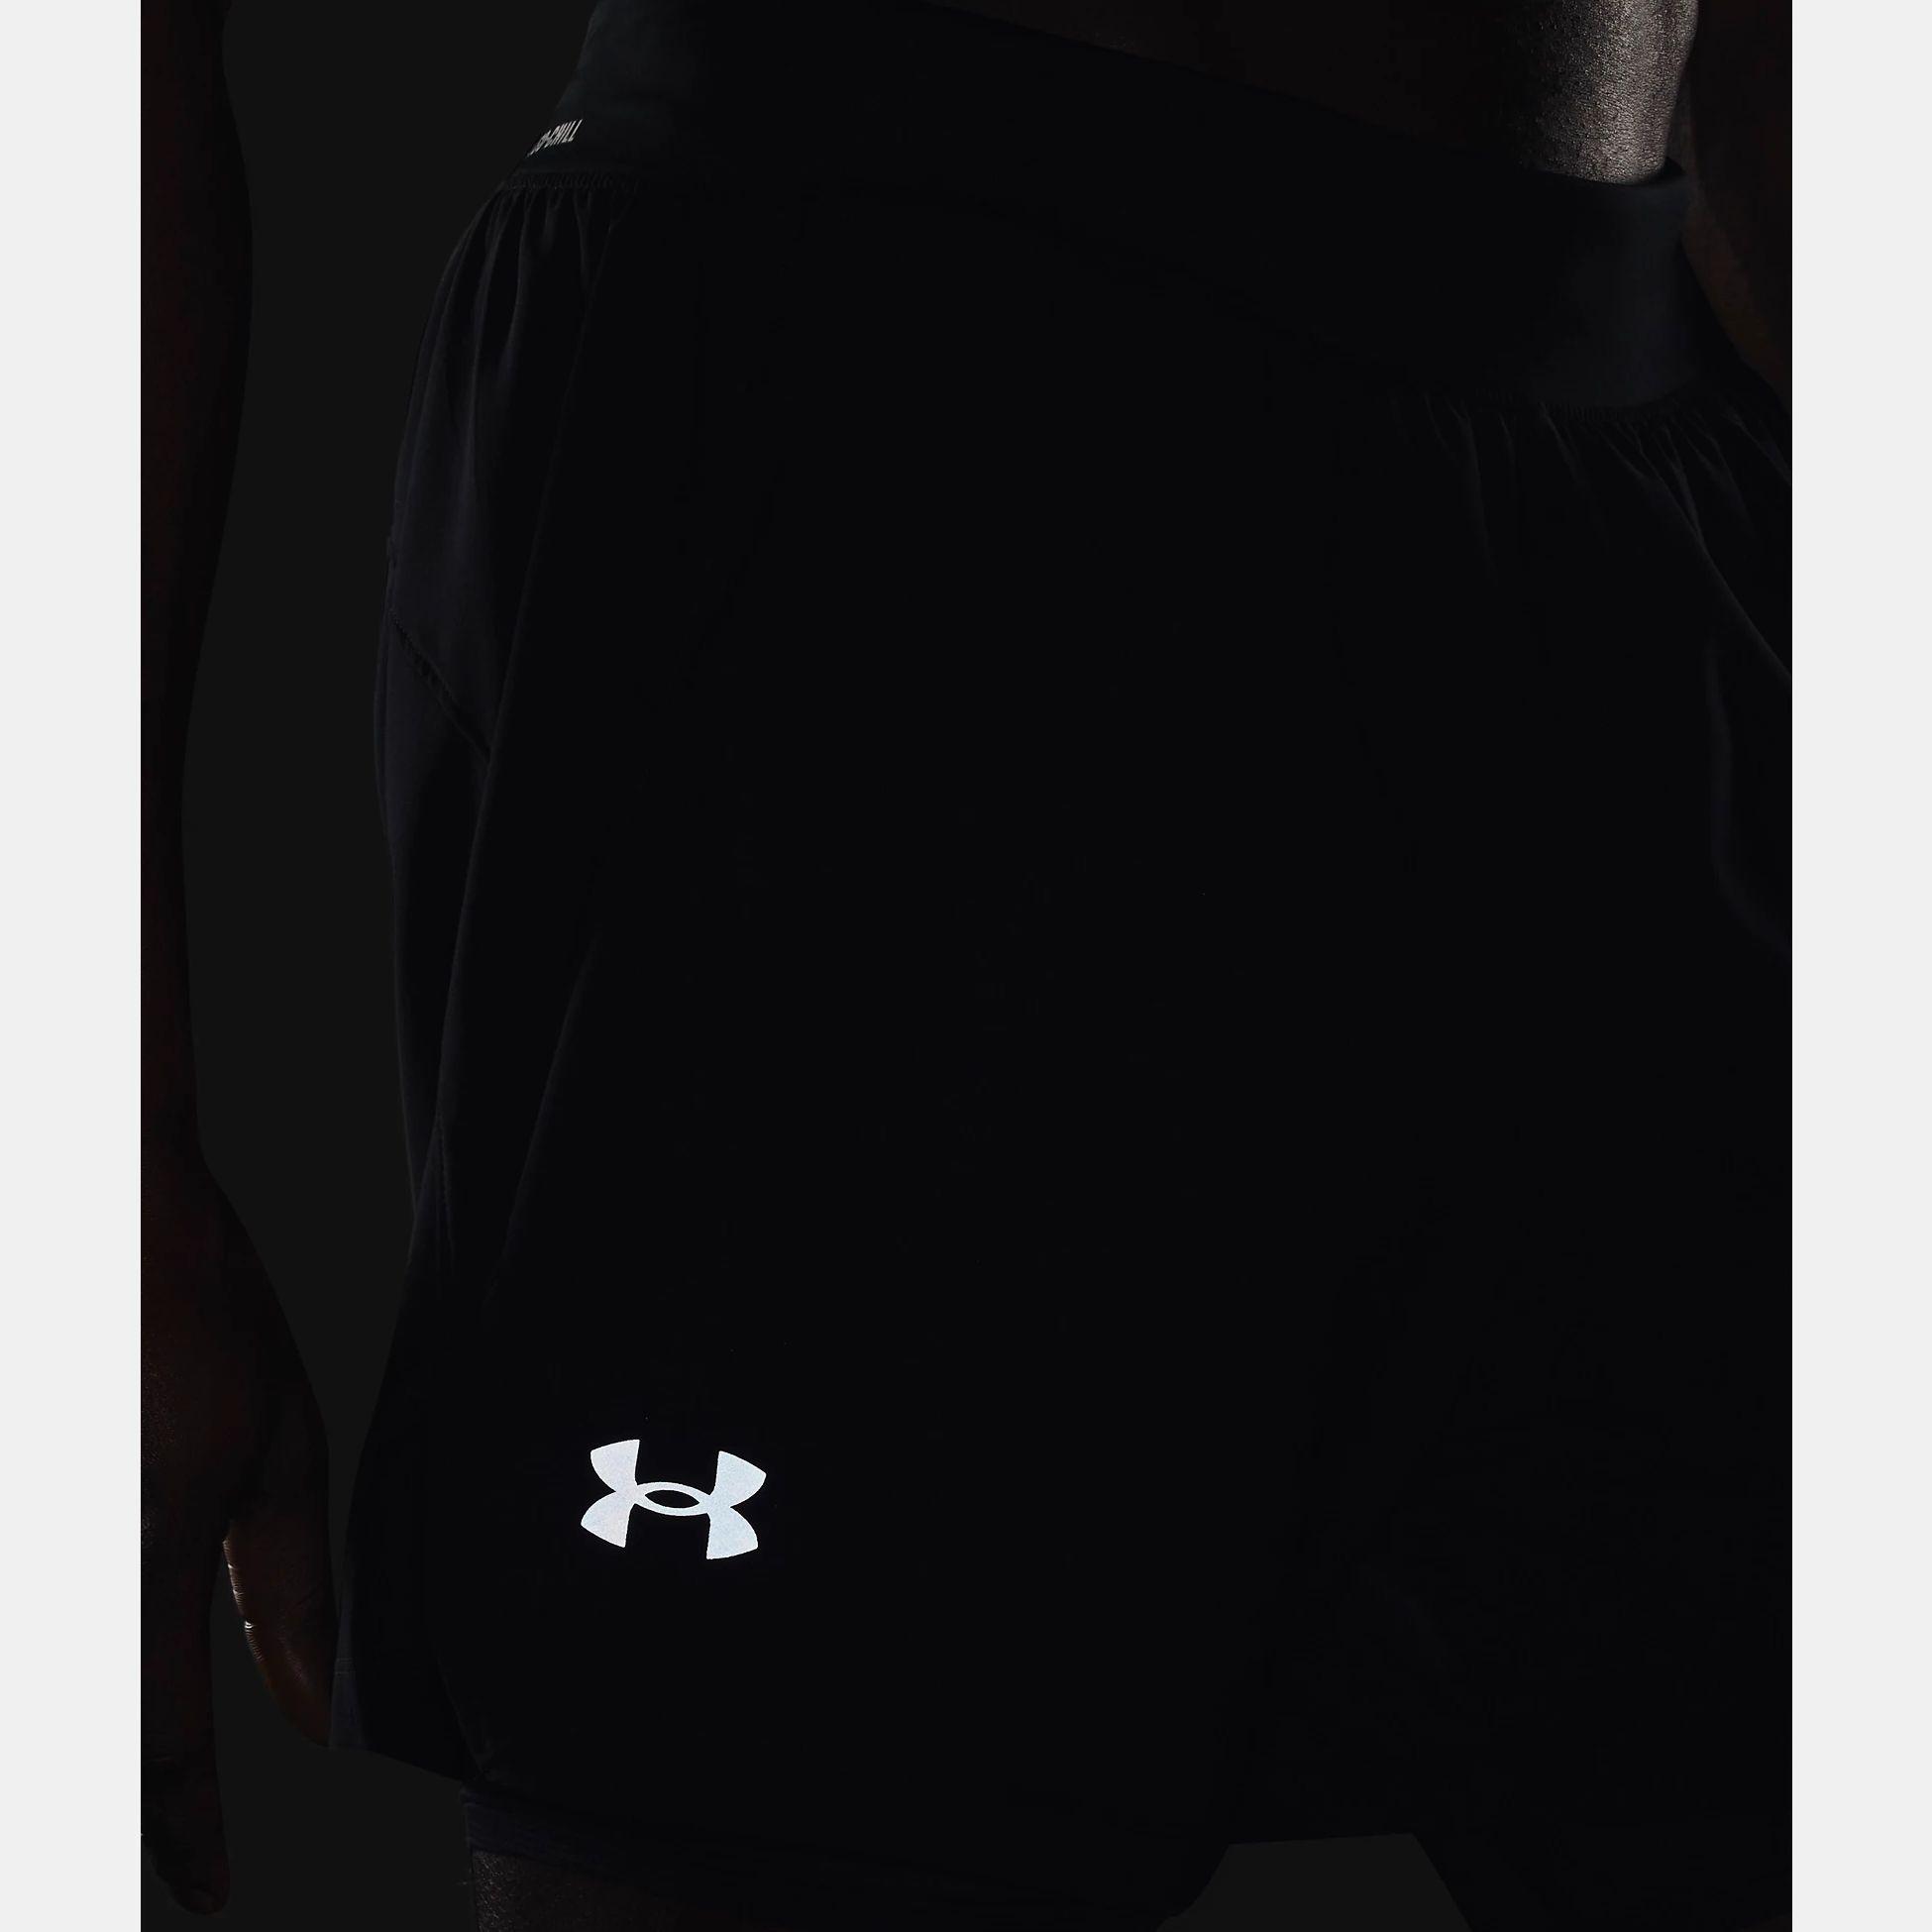 Îmbrăcăminte -  under armour UA Iso-Chill Run 2-in-1 Shorts